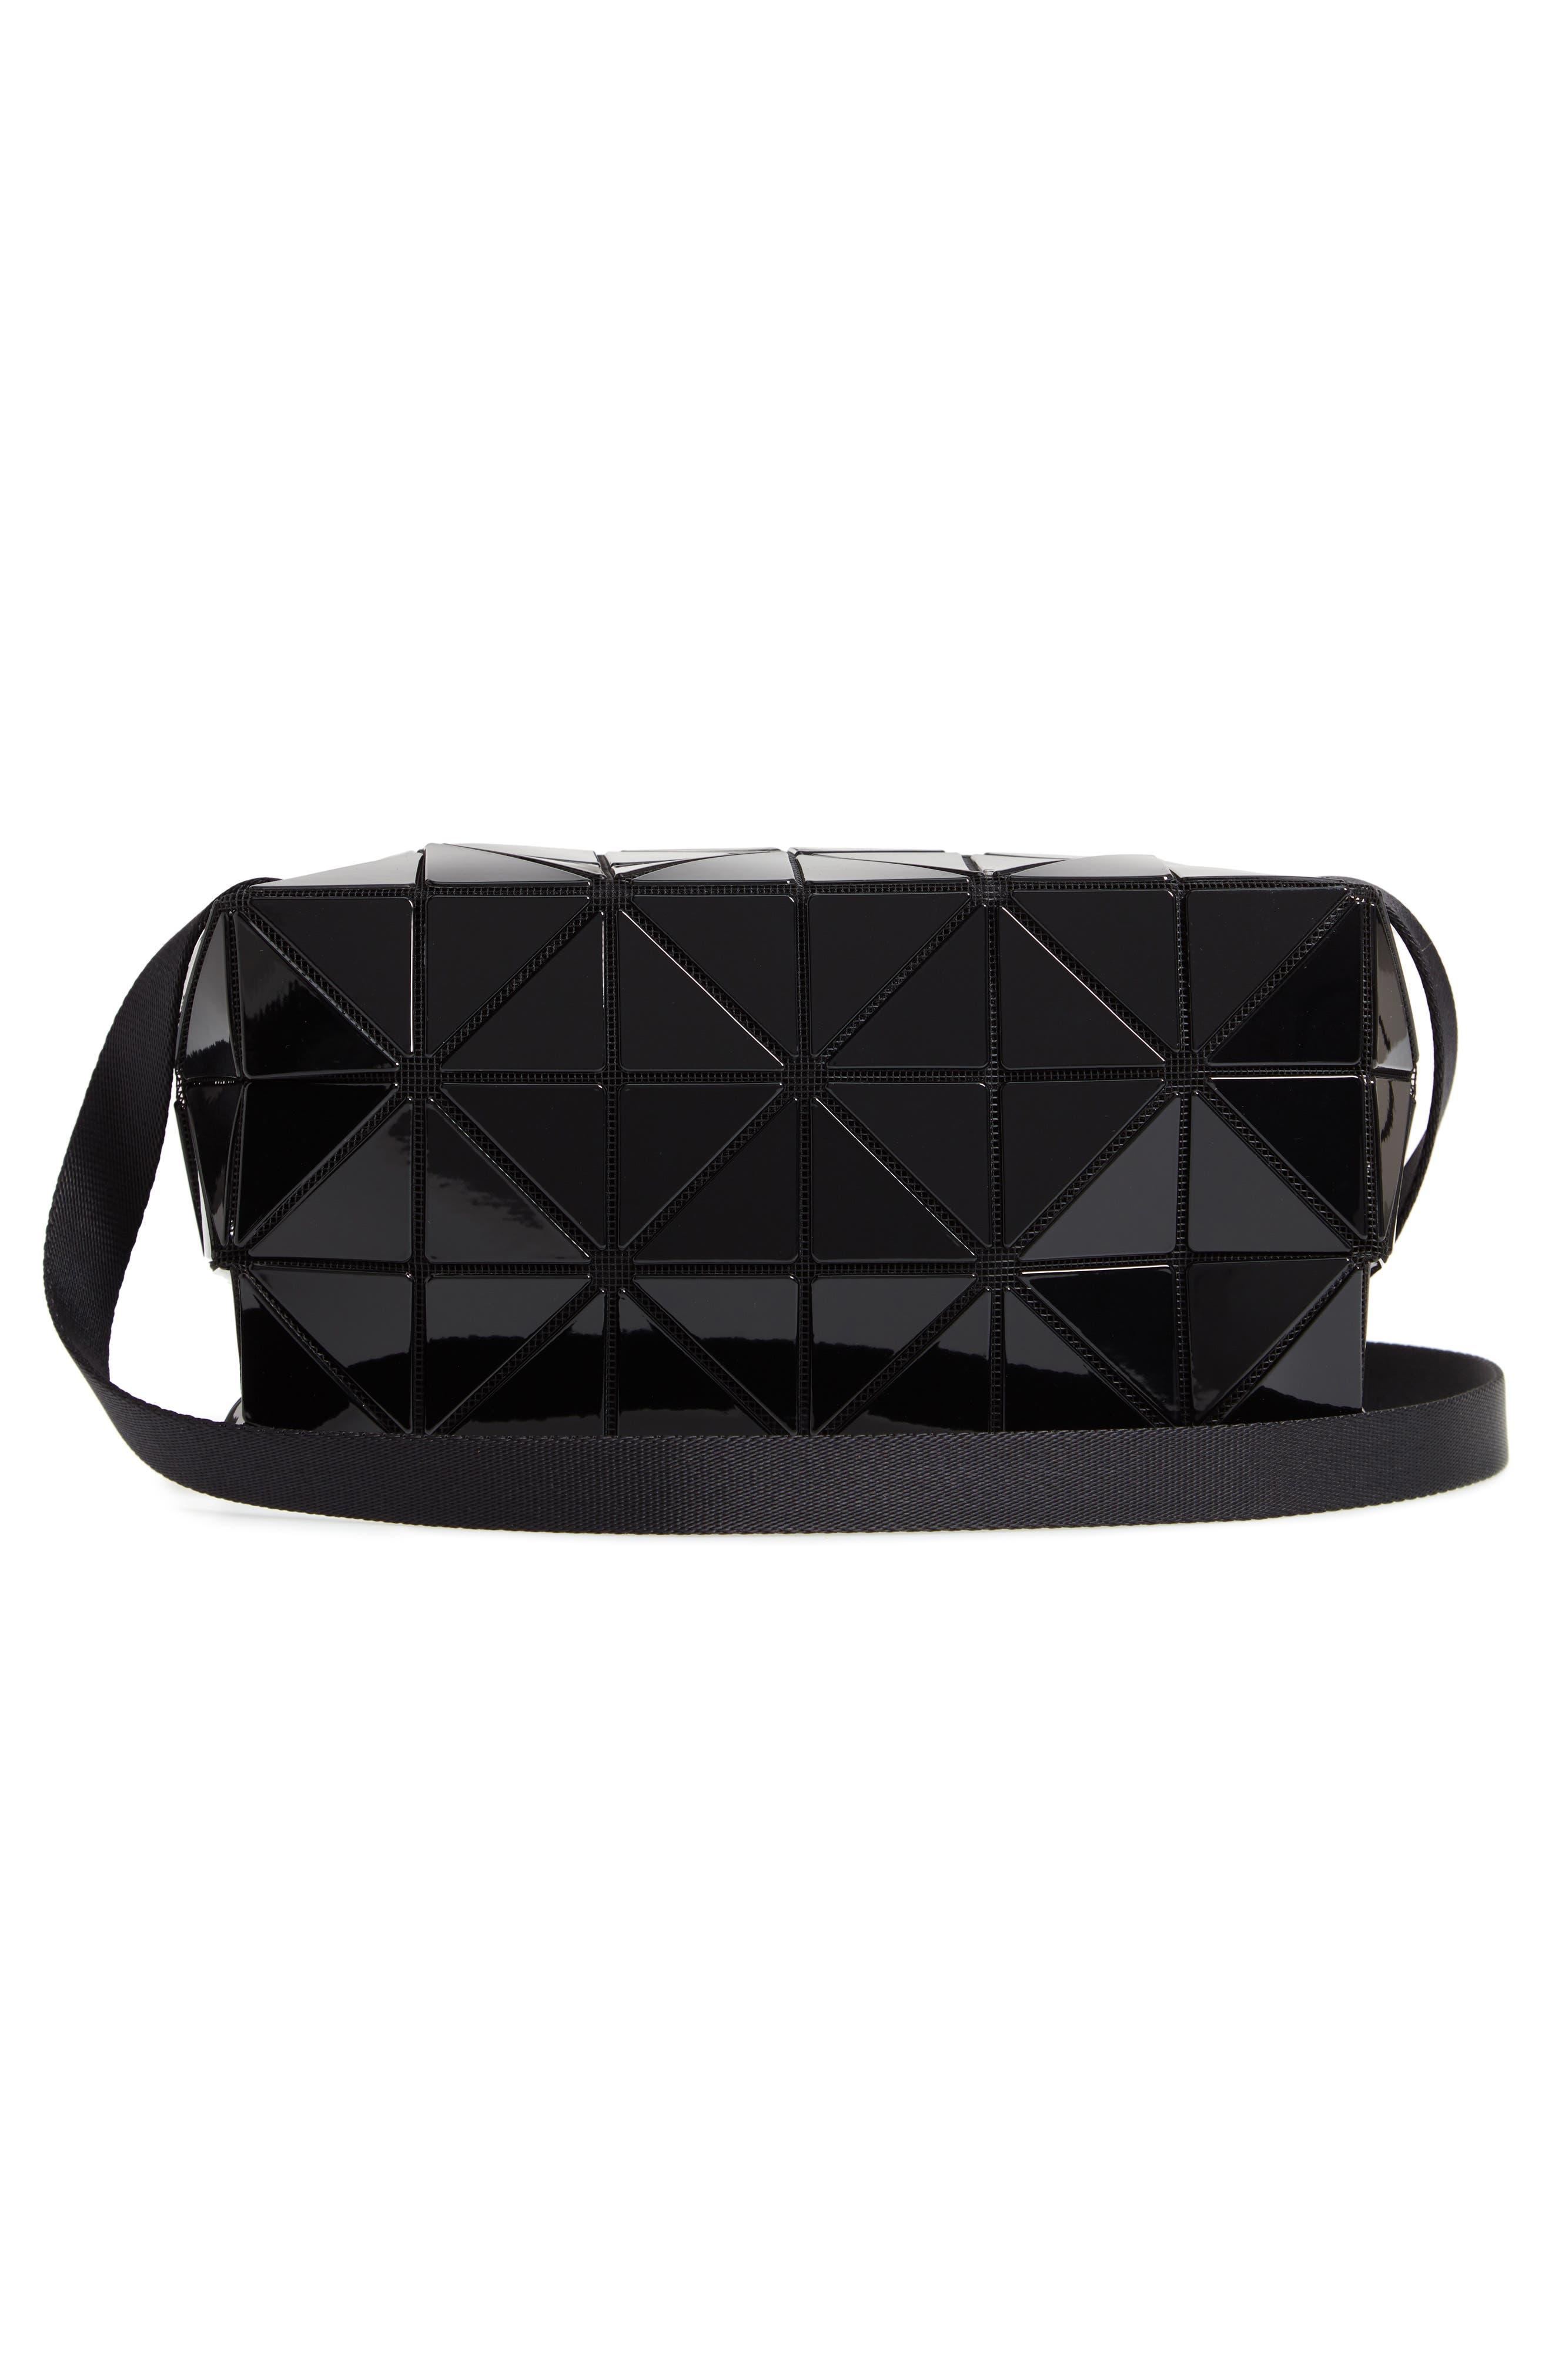 Carton Crossbody Bag,                             Alternate thumbnail 3, color,                             BLACK